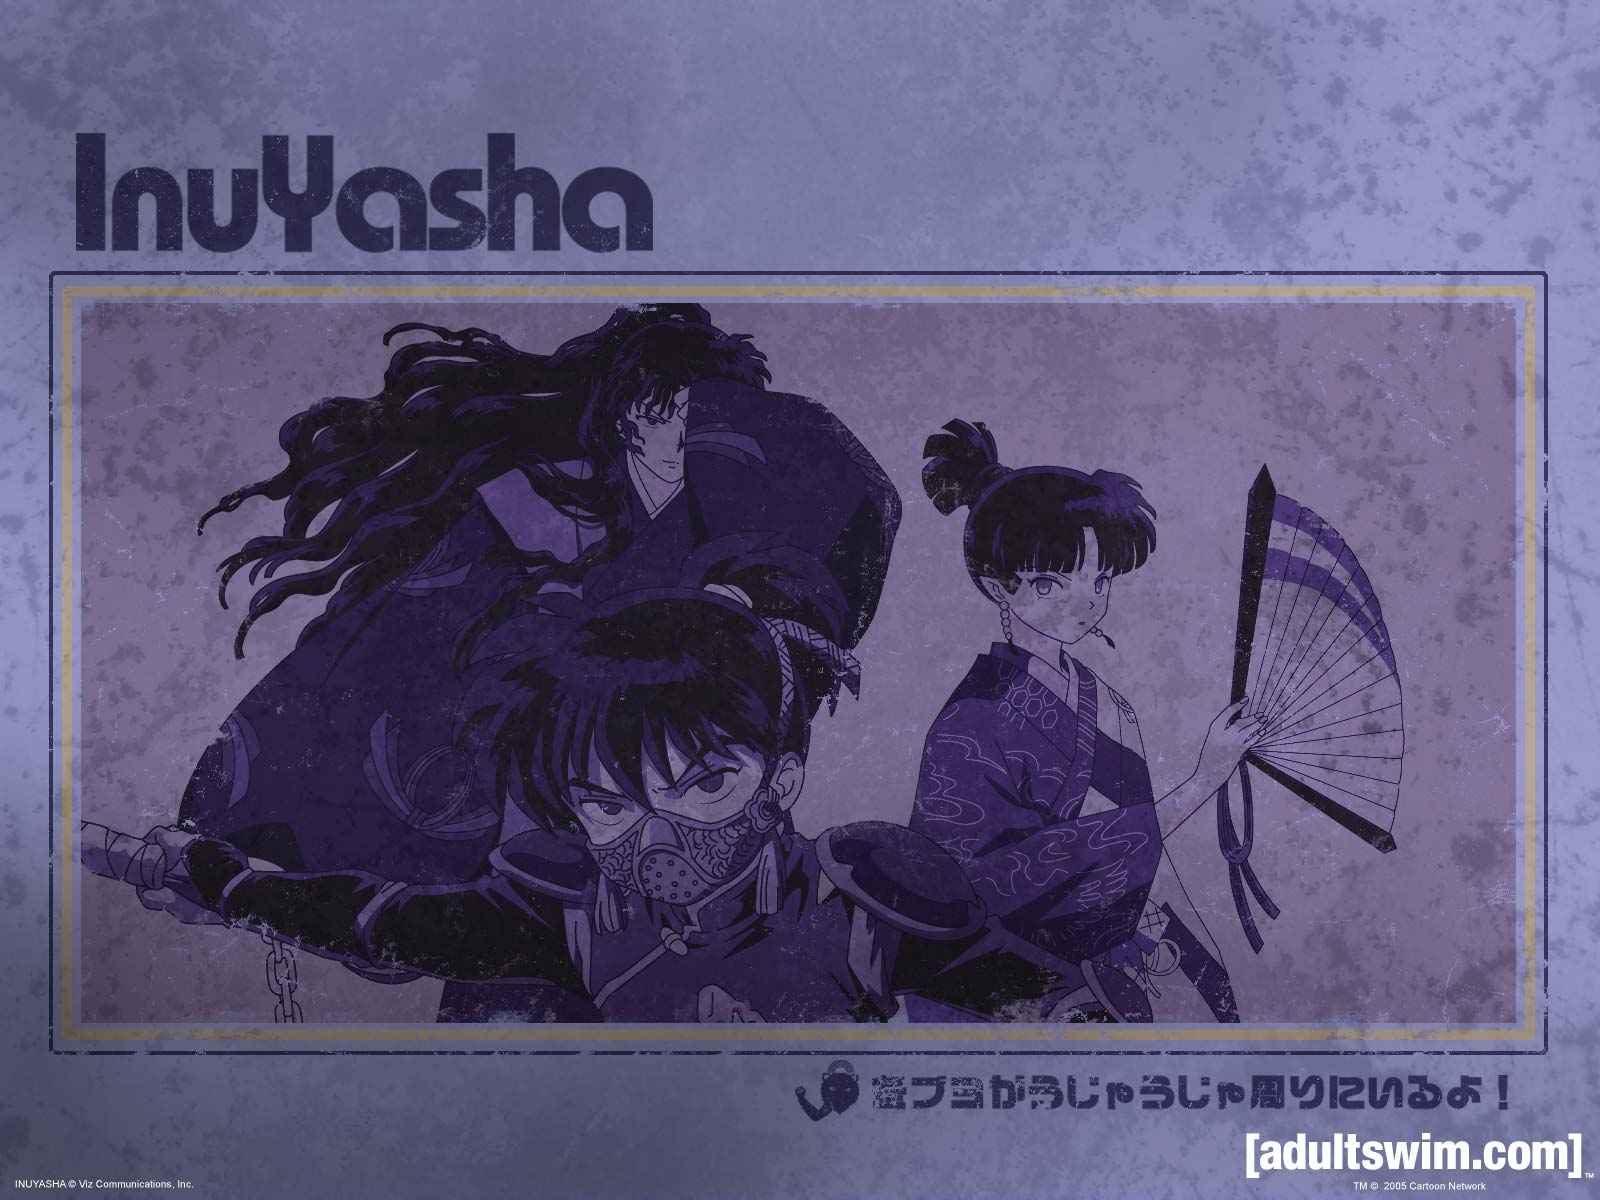 Inuyasha Wallpaper Album Cover 1906986 Hd Wallpaper